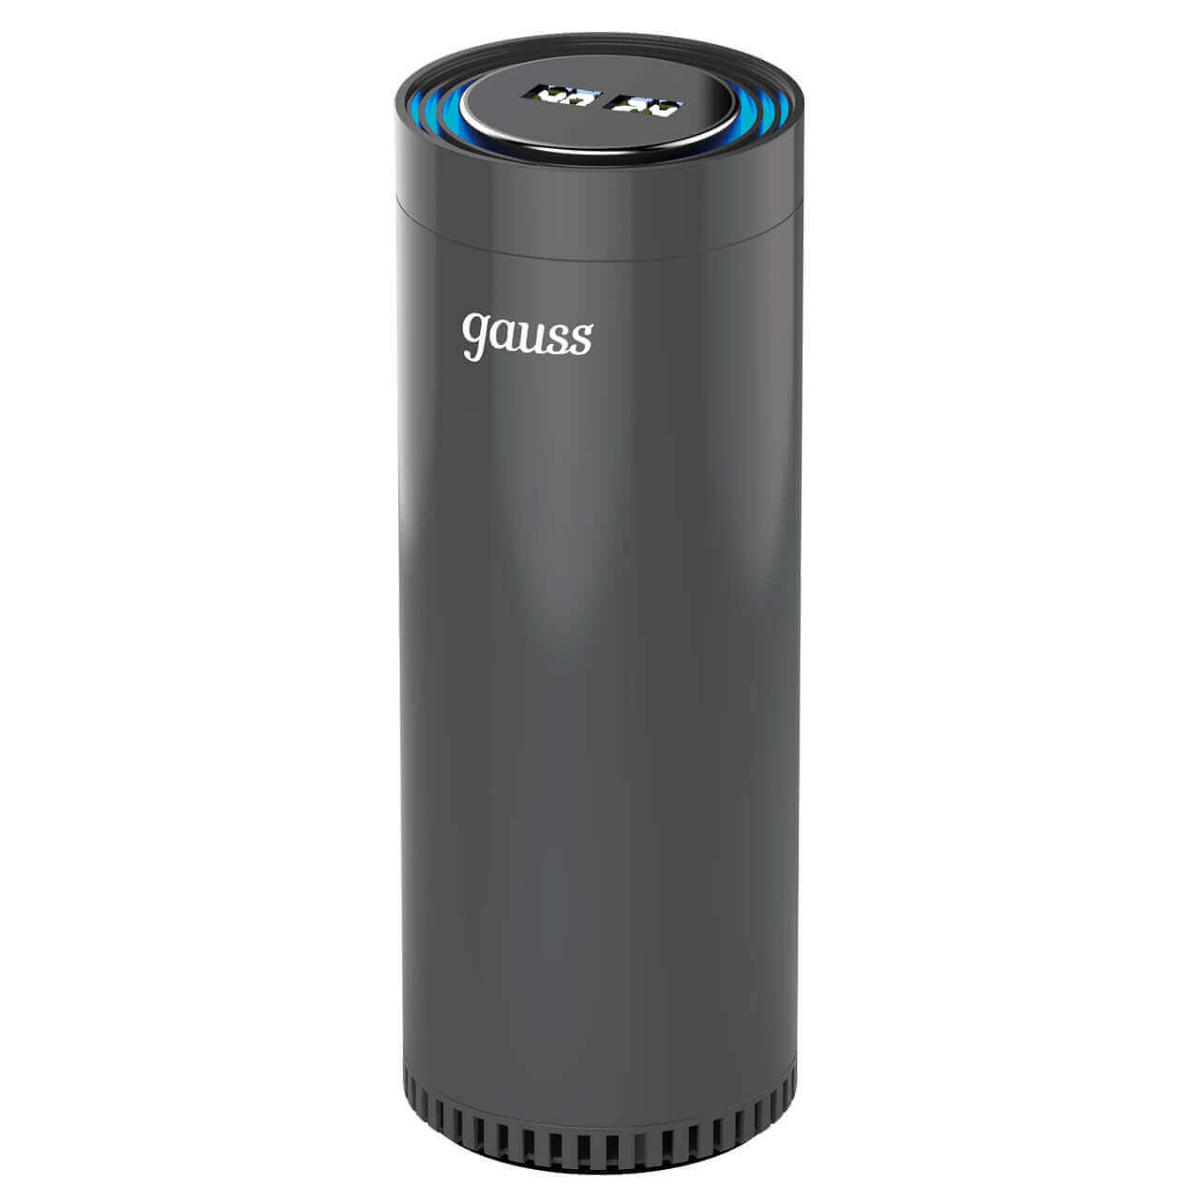 Рециркулятор Gauss GR020 Guard (Функция ароматерапия)